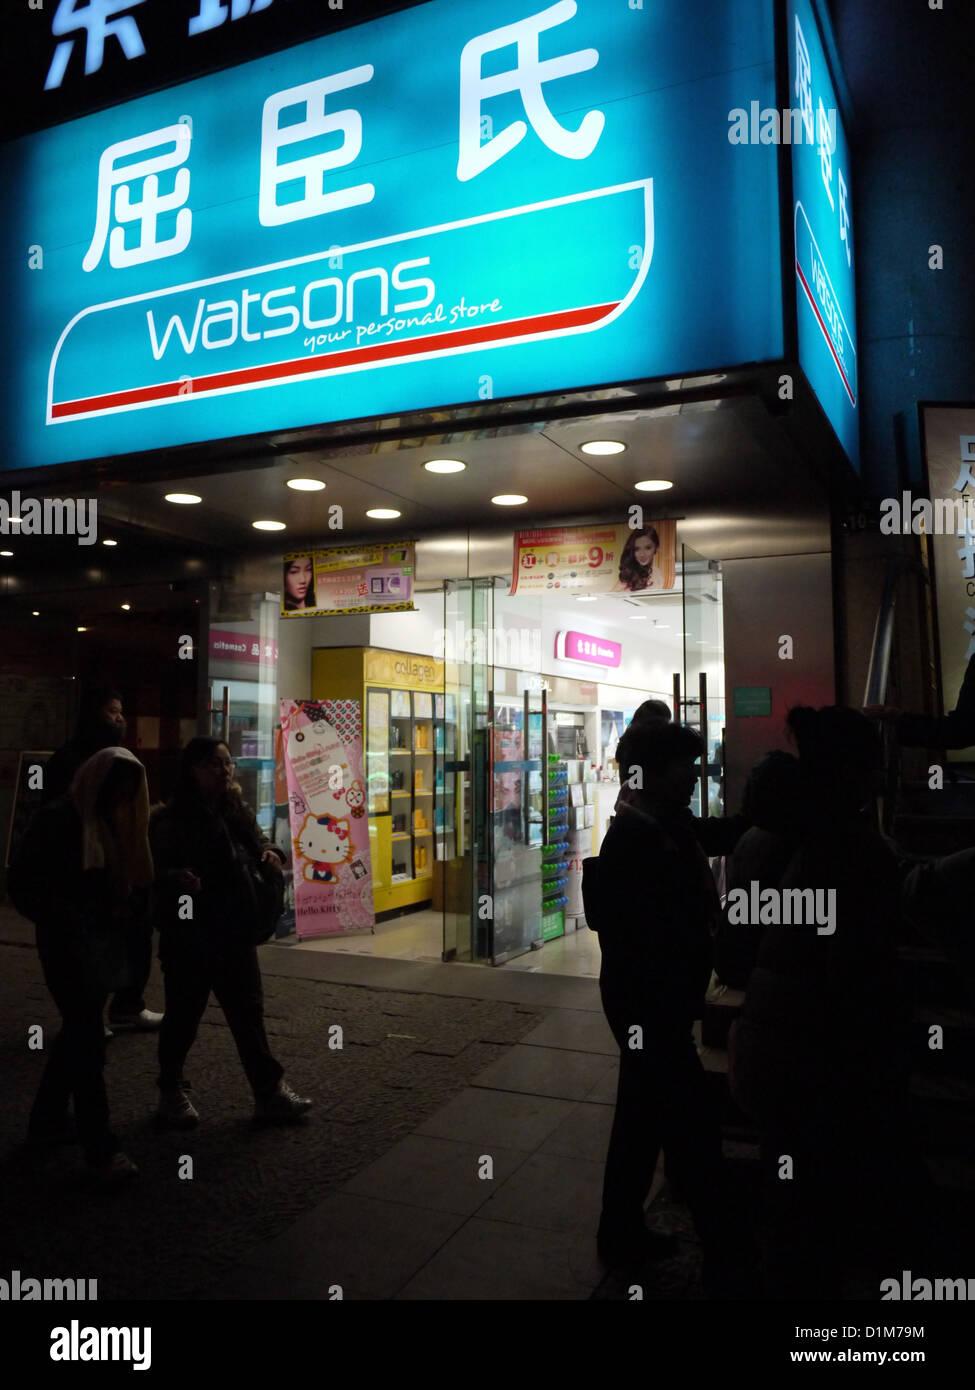 Watsons personal care store china - Stock Image